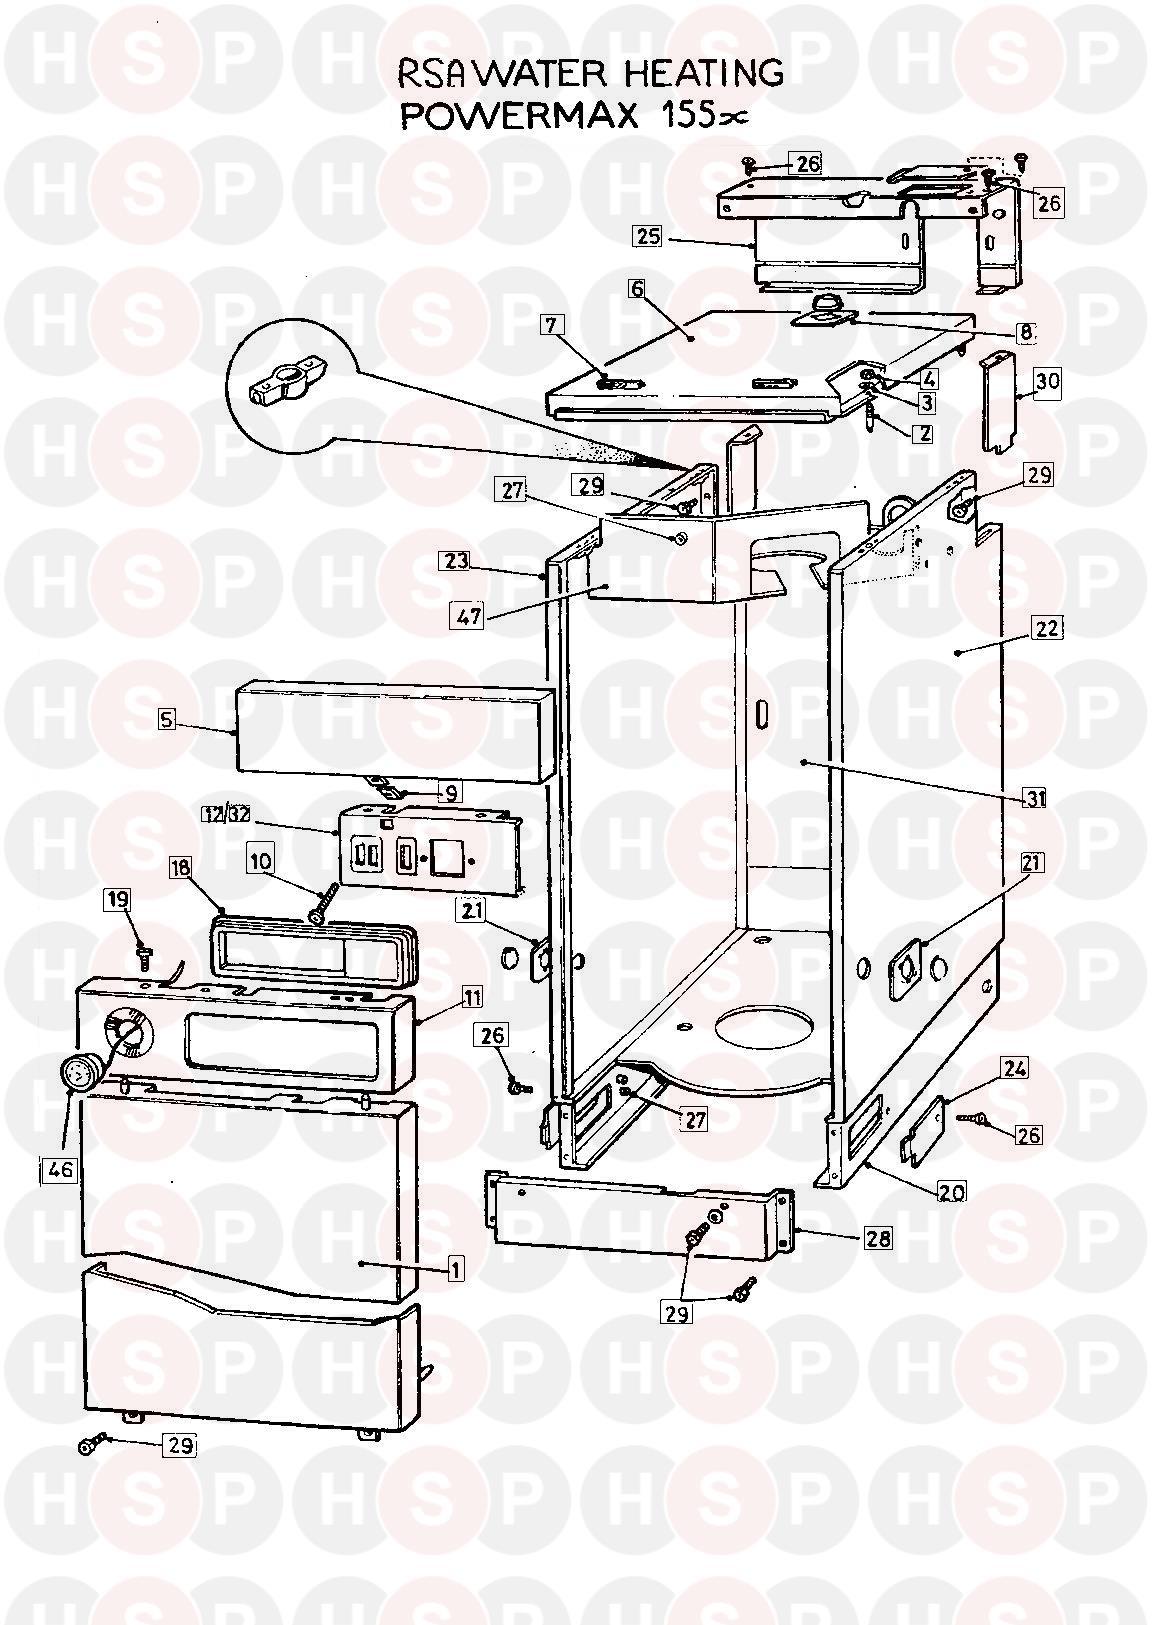 powermax powermax 155x fss appliance diagram  casing